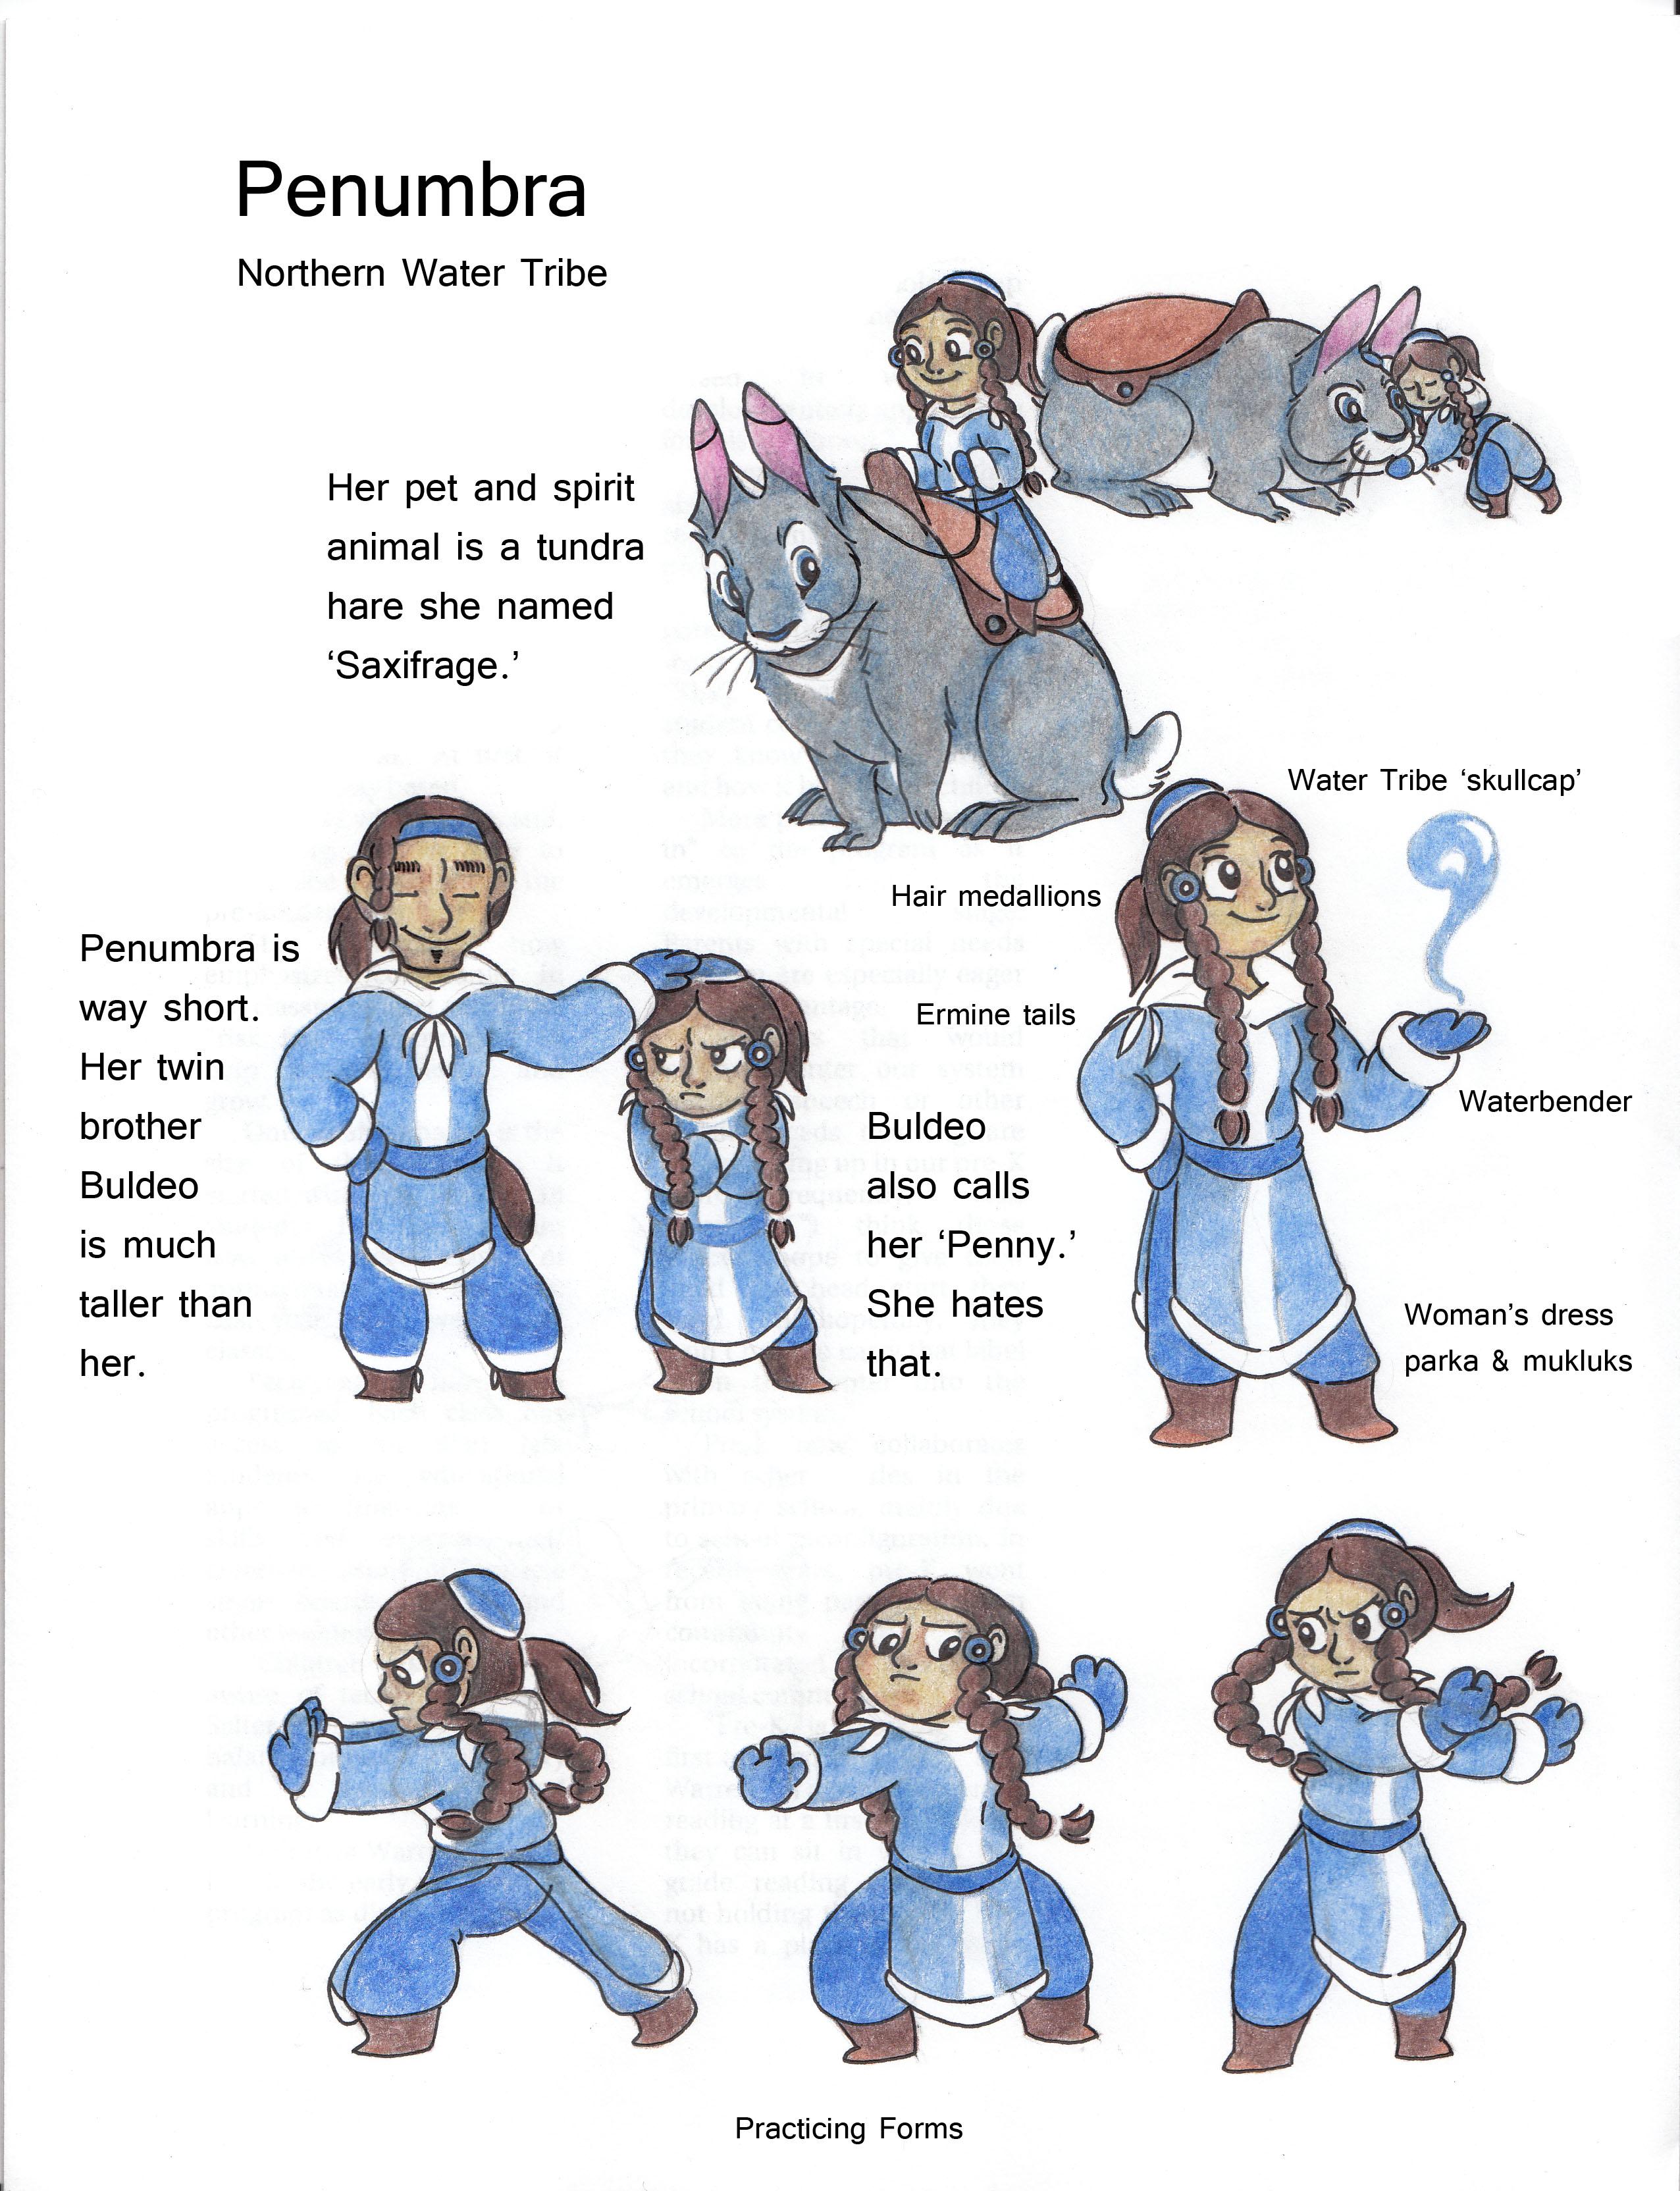 Avatar TLA OC Penumbra by Dead-Raccoons